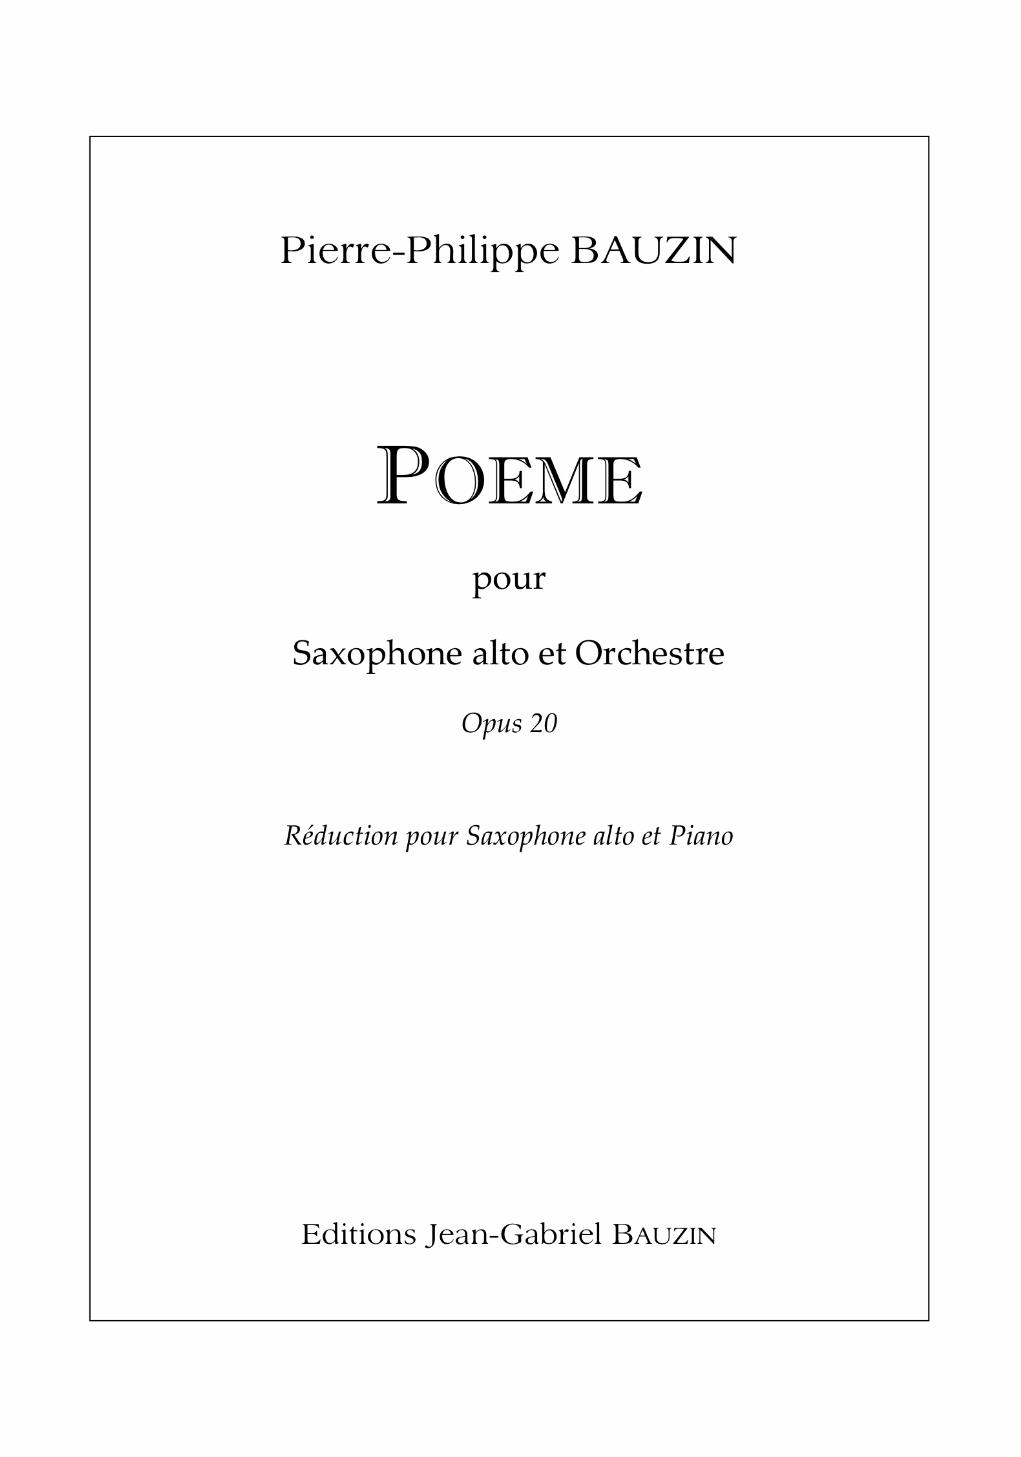 Poem by Pierre-Philippe Bauzin